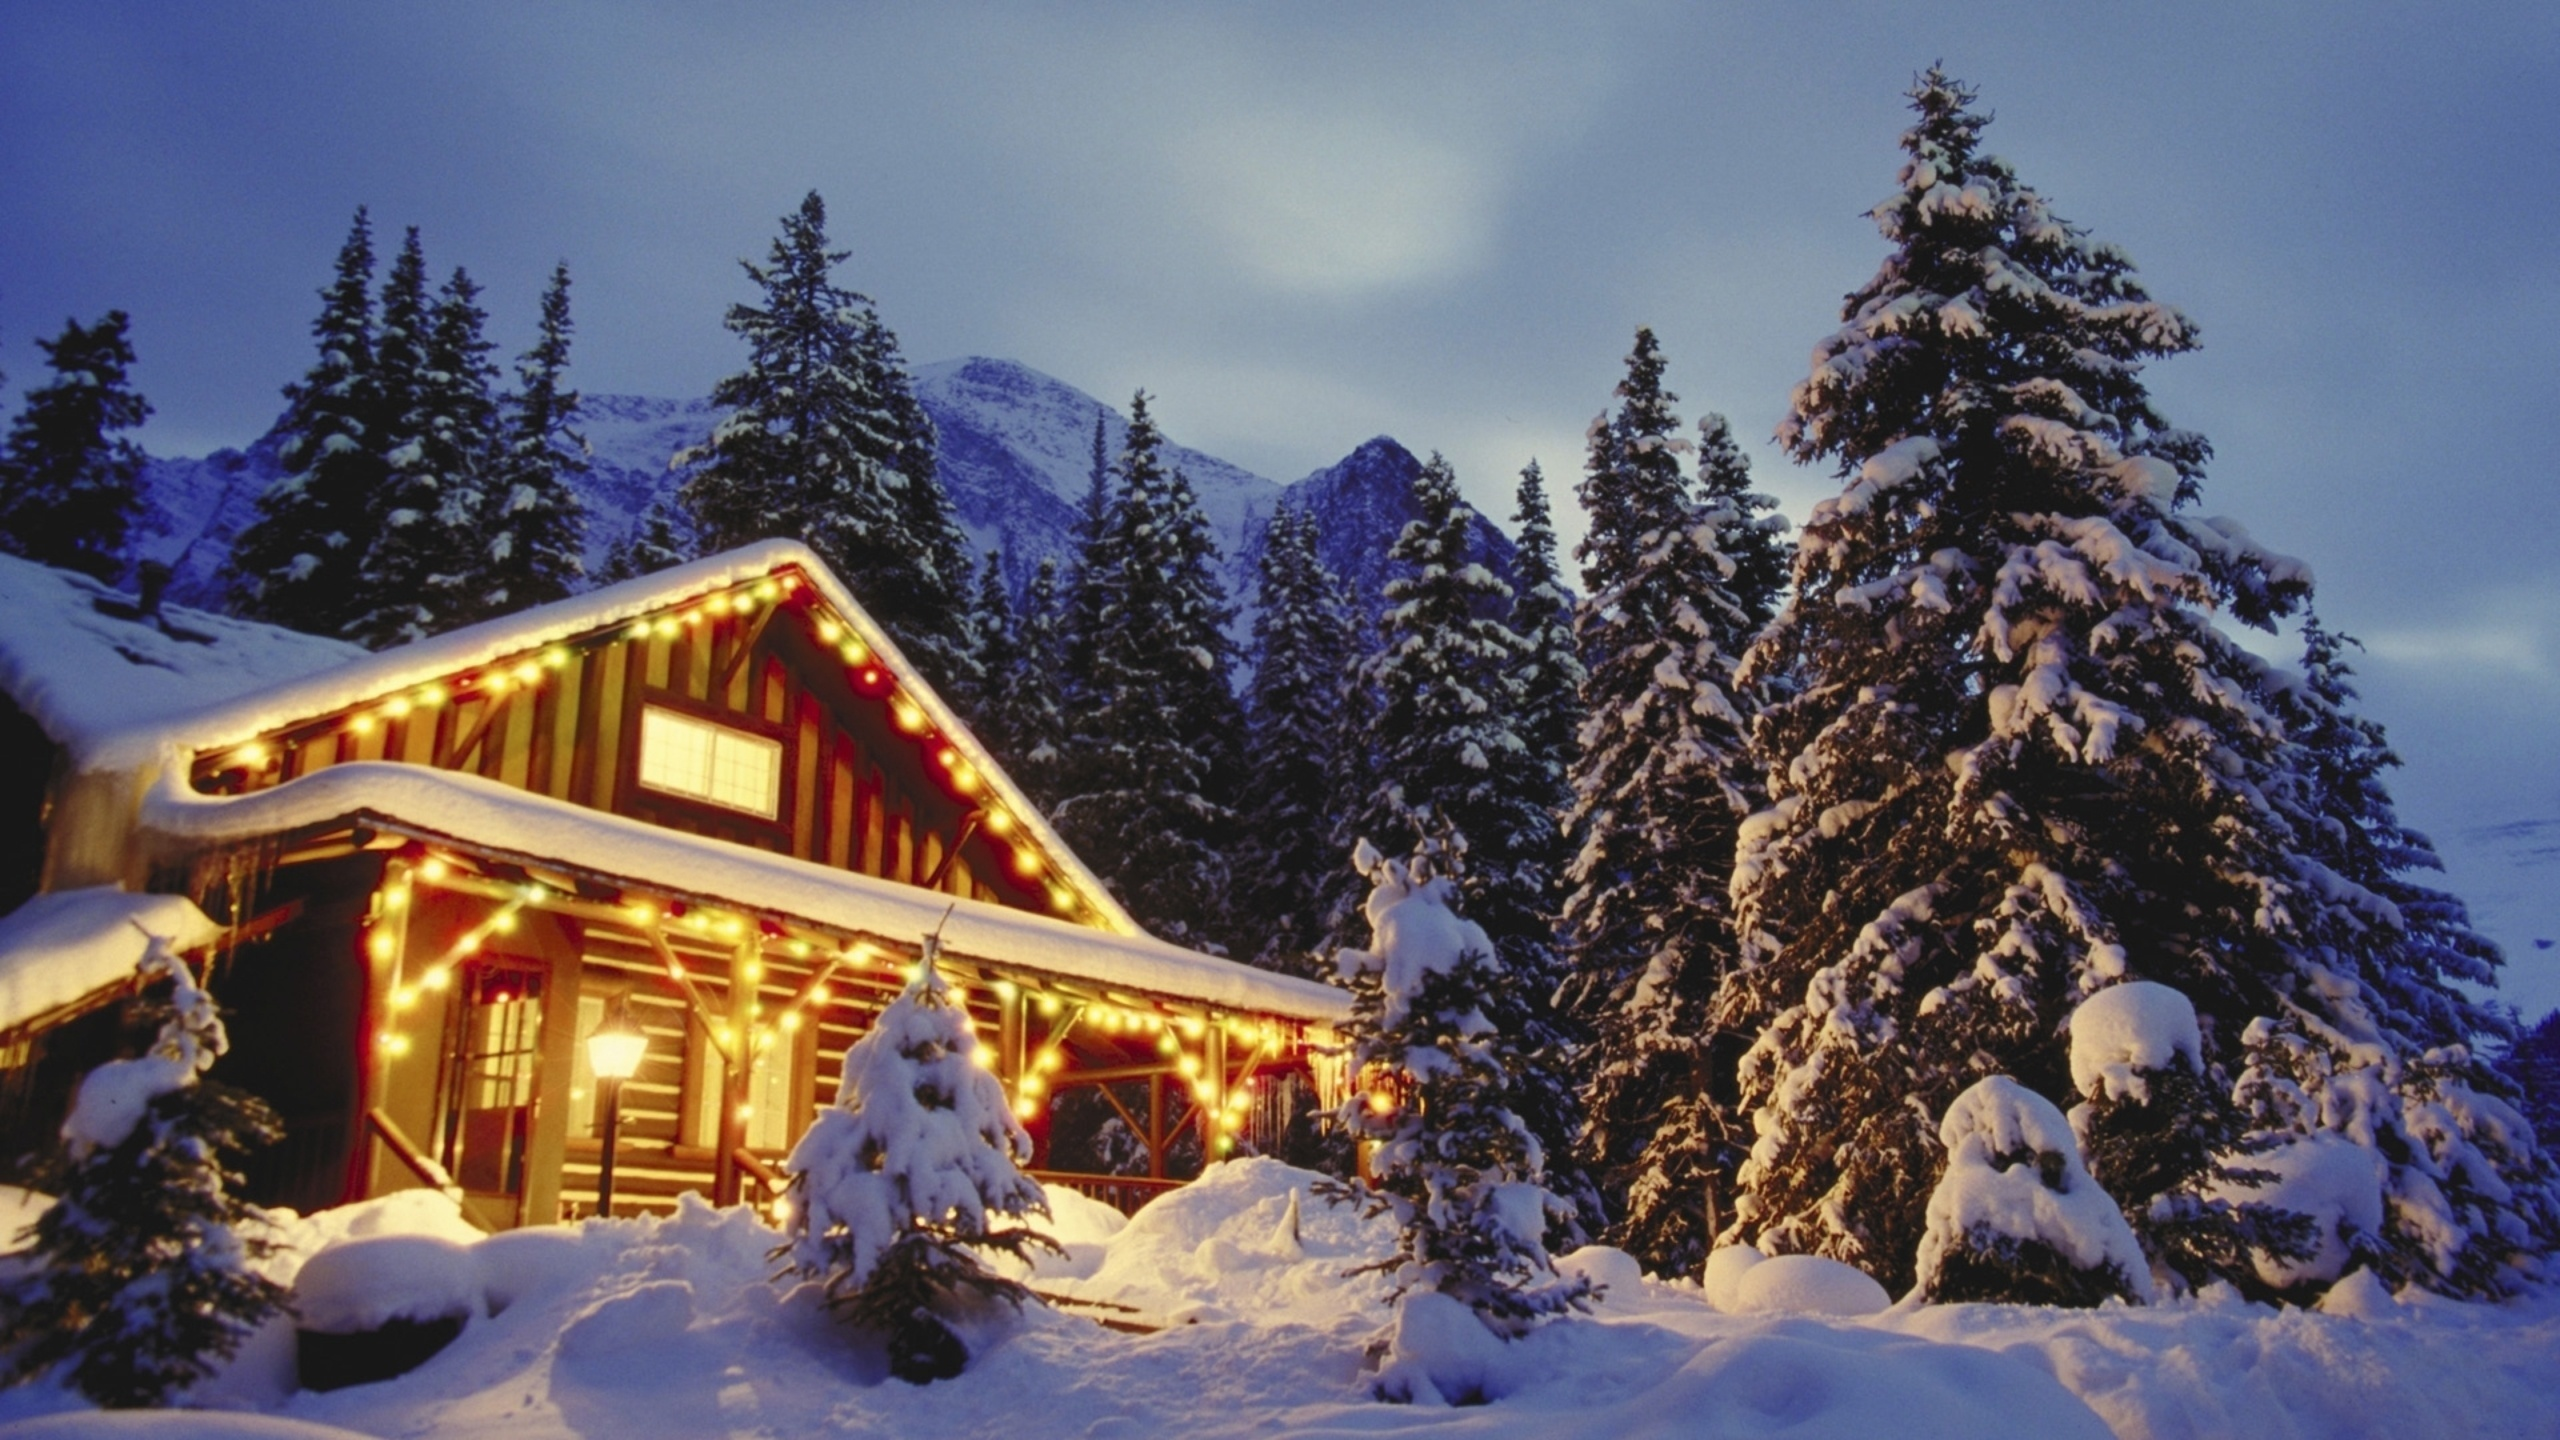 toluca lake christmas trees - HD2560×1440